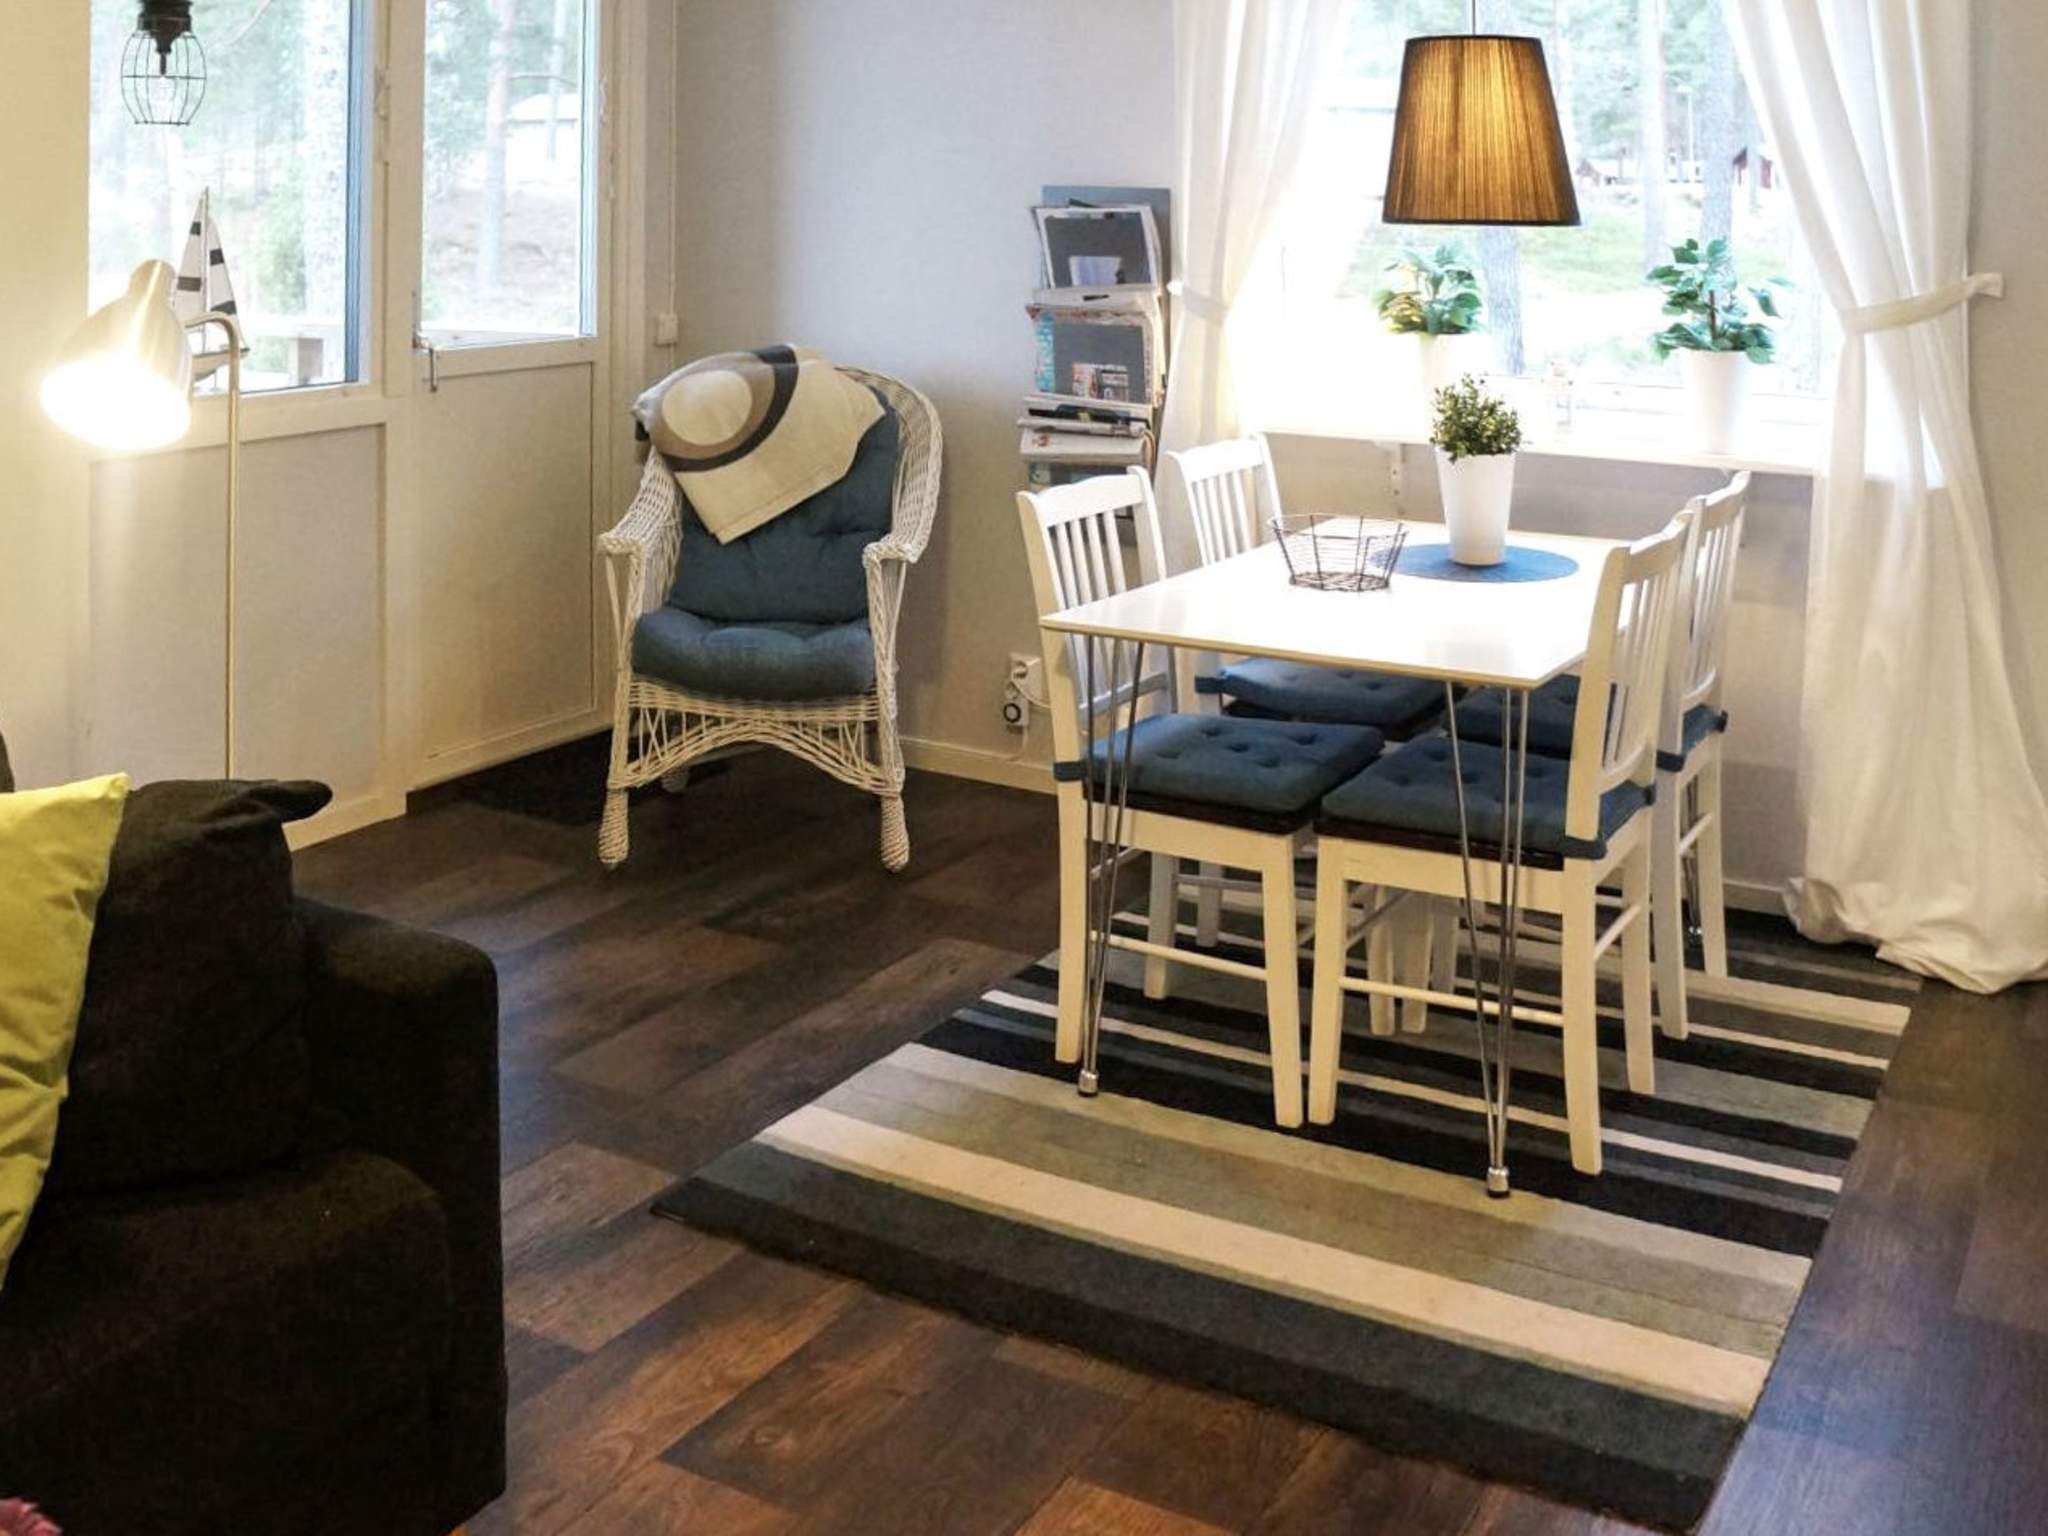 Ferienhaus Oskarshamn (2358219), Oskarshamn, Kalmar län, Südschweden, Schweden, Bild 4